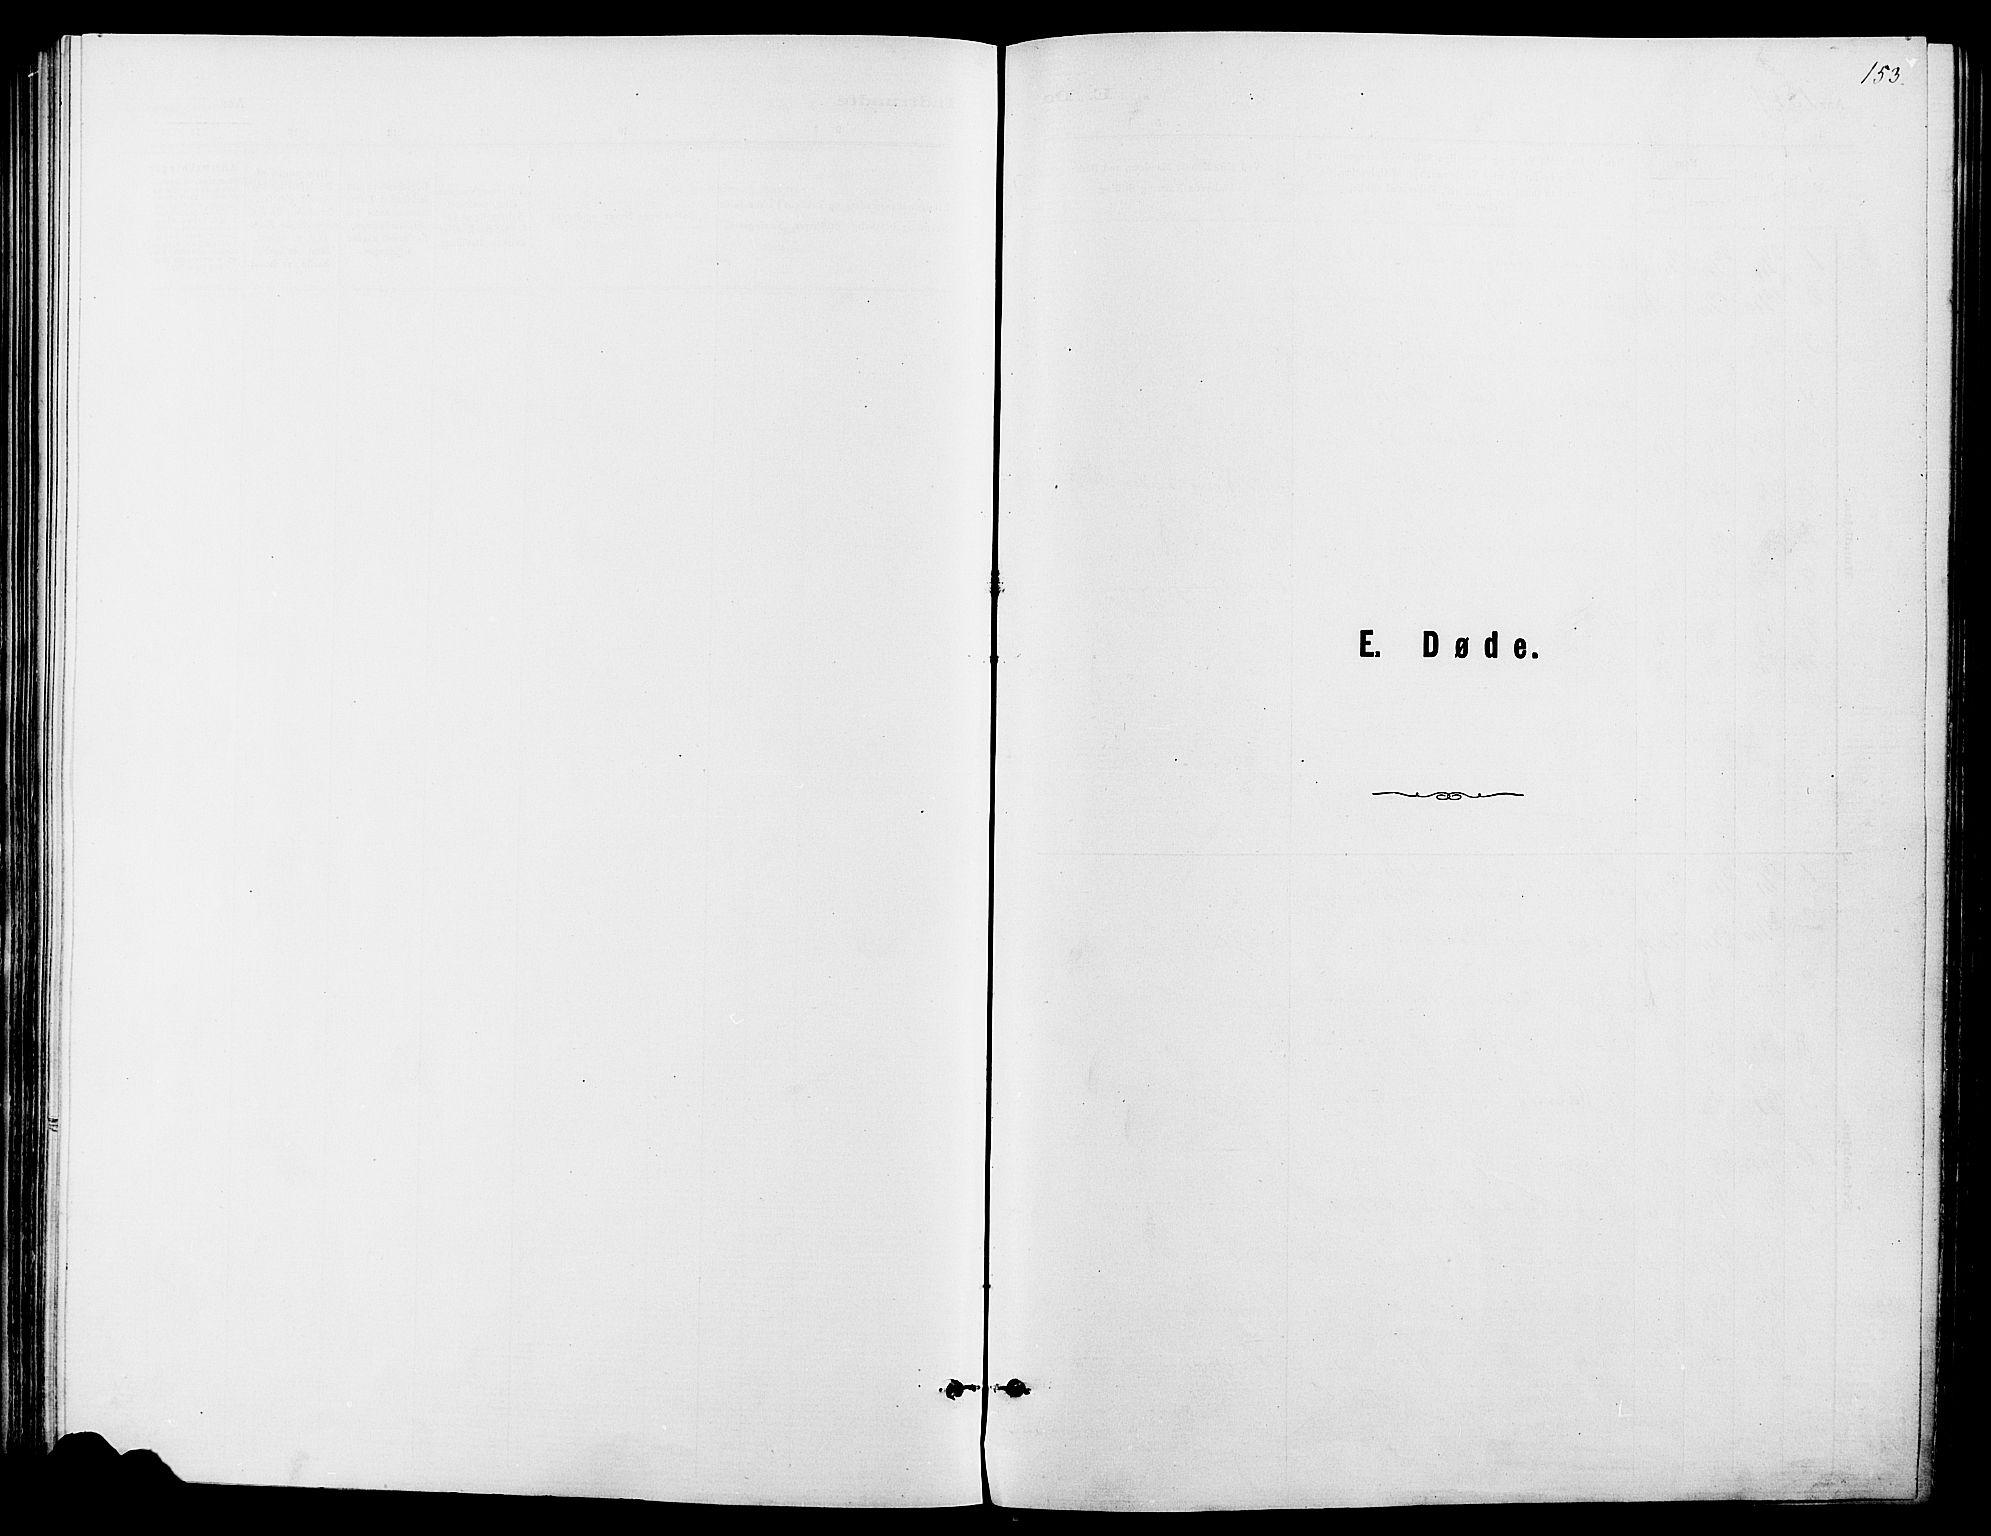 SAH, Dovre prestekontor, Ministerialbok nr. 2, 1879-1890, s. 153